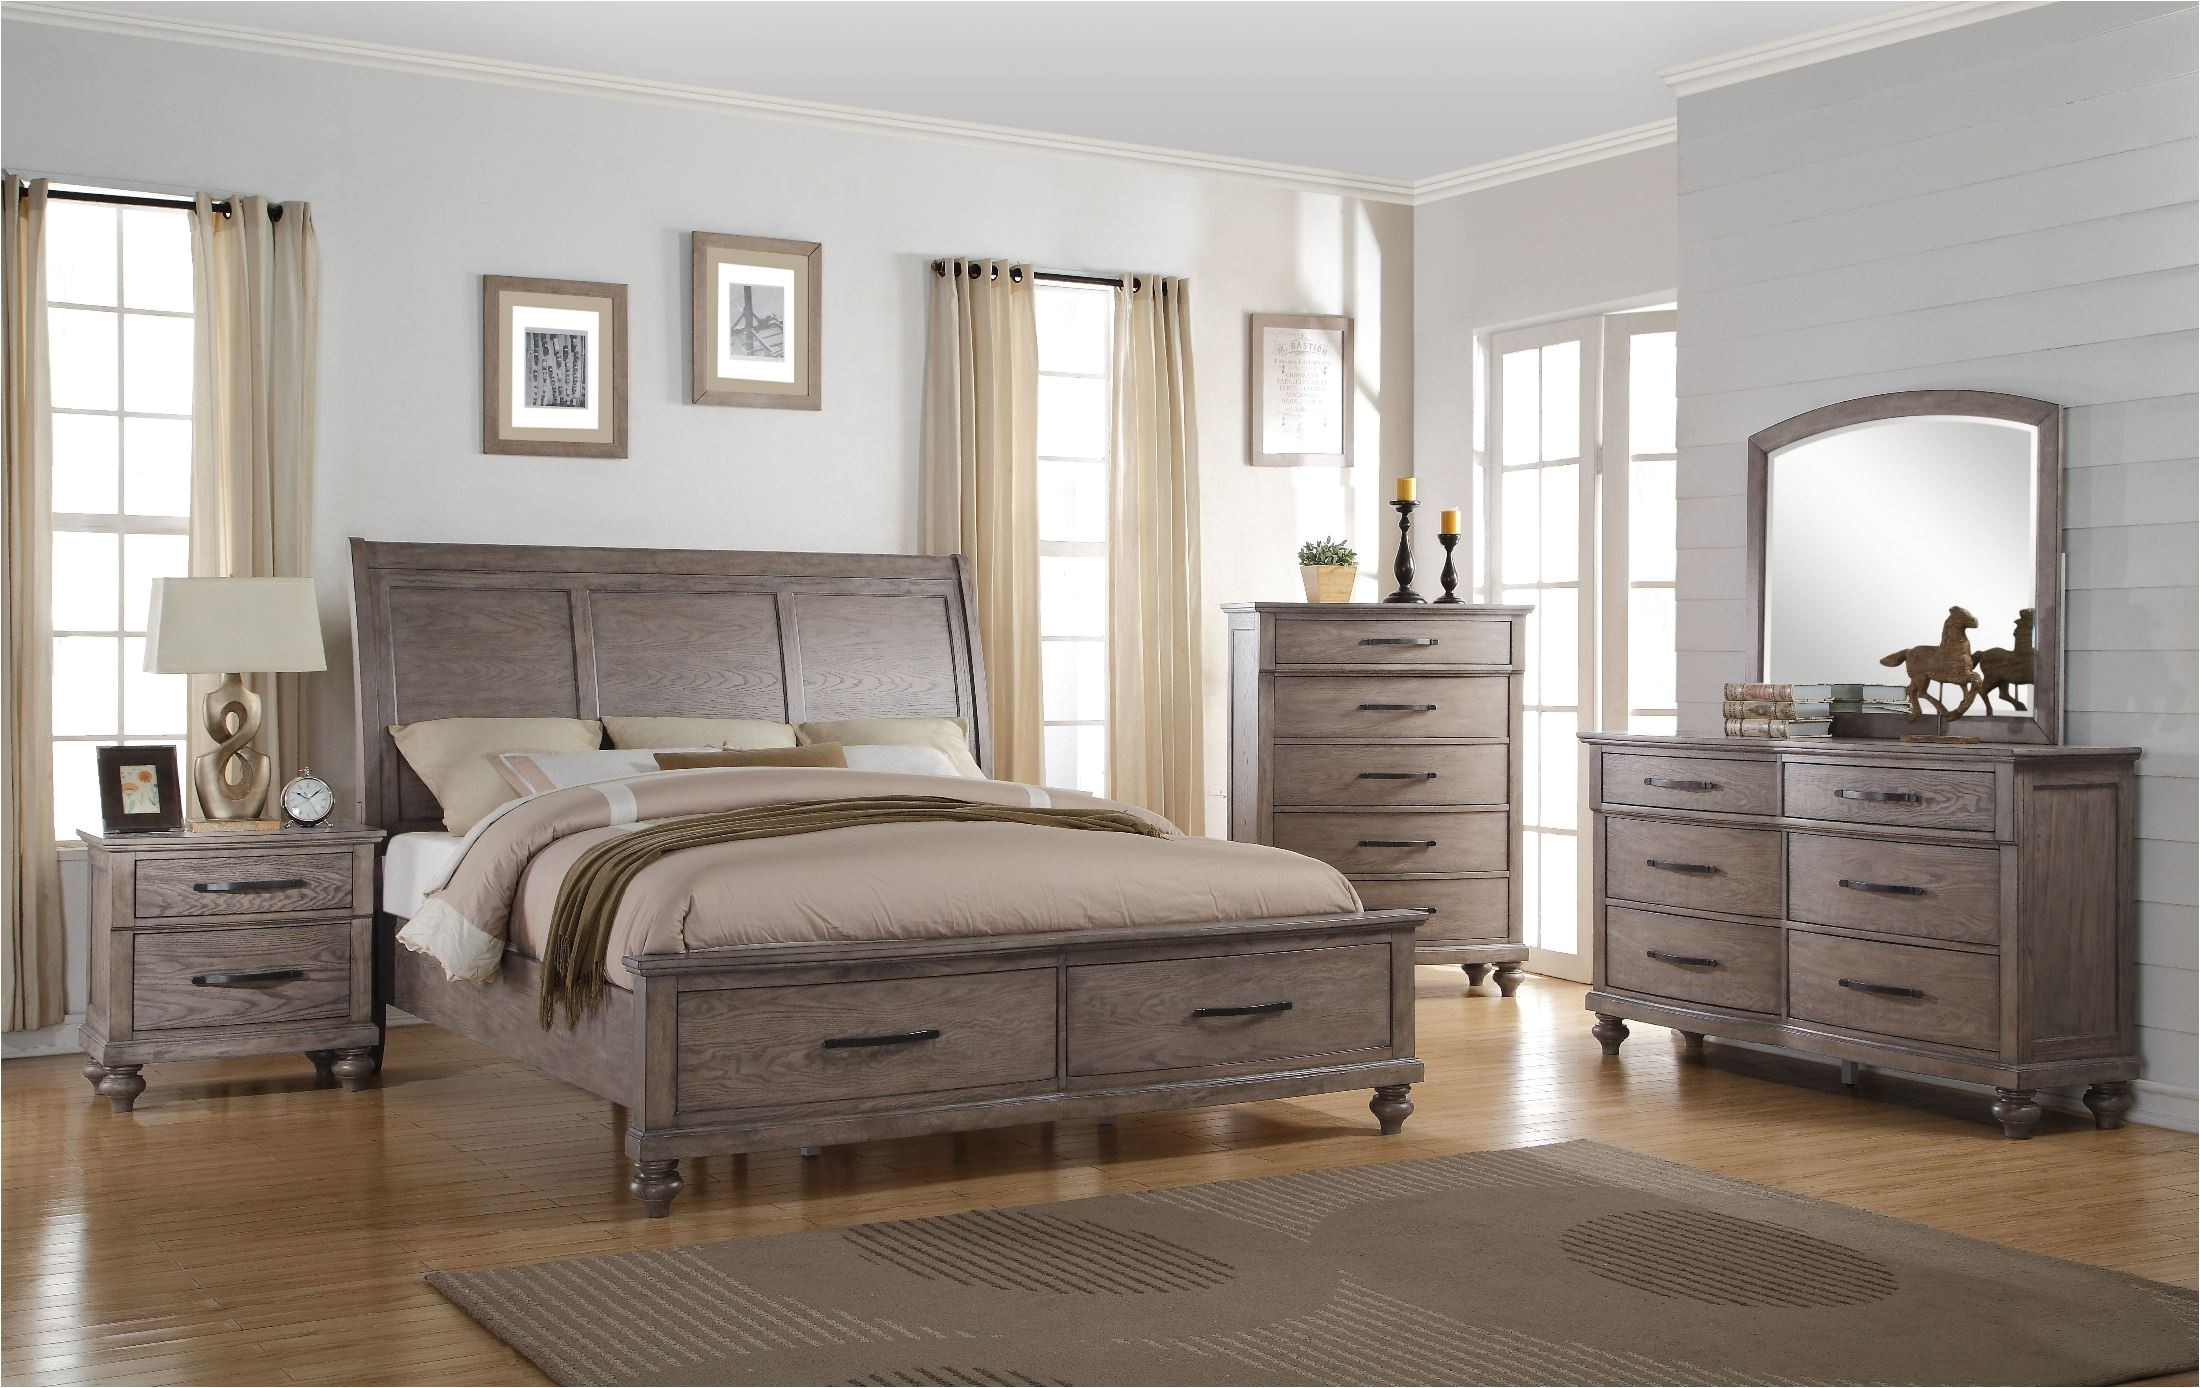 graceful house sketch under discontinued stanley bedroom furniture a